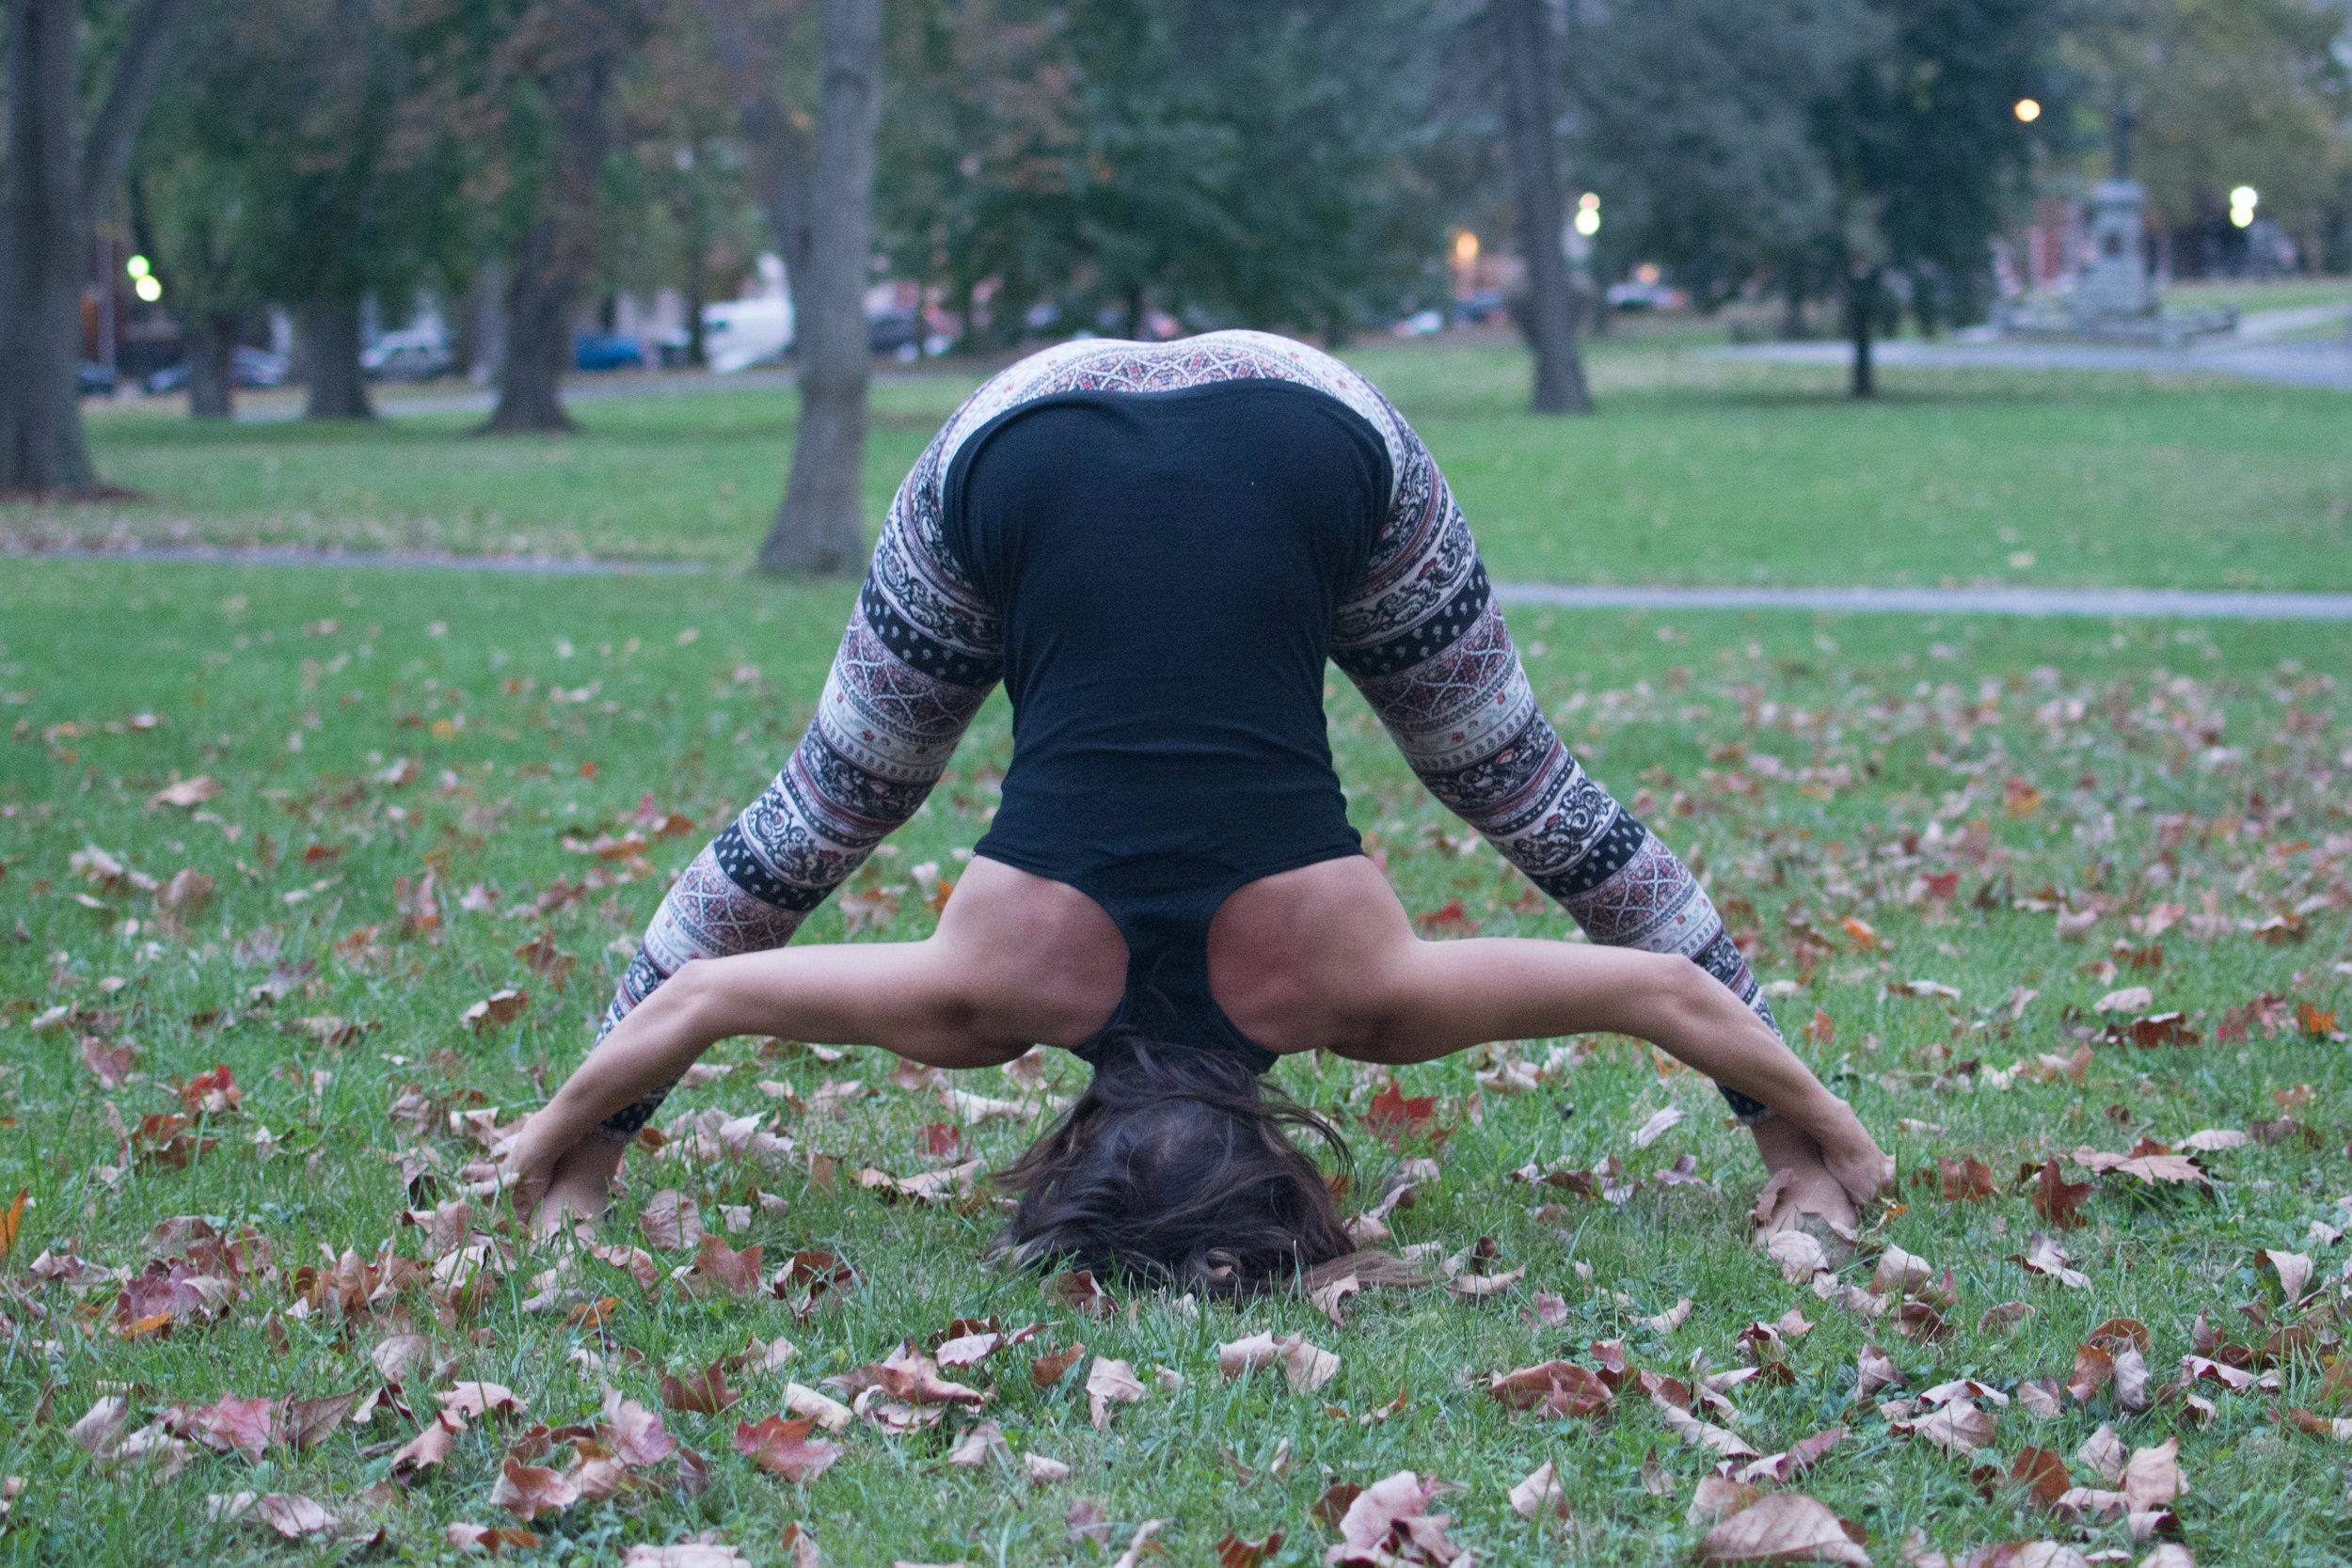 bikram-yoga-west-reading-forward-bend.jpg